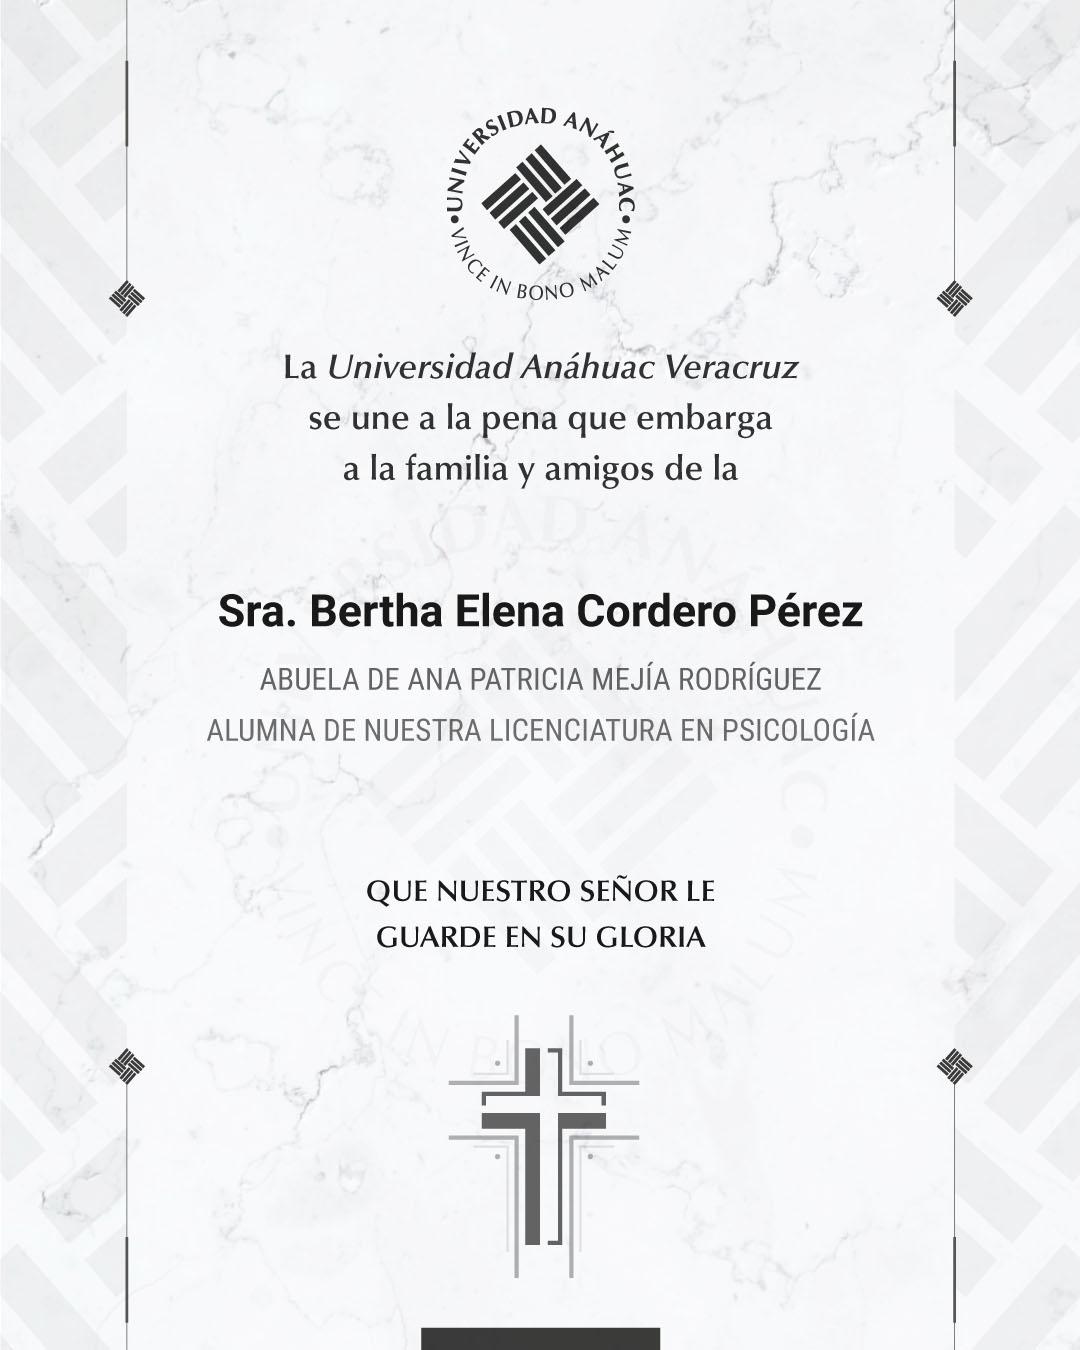 12 / 14 - Sra. Bertha Elena Cordedo Pérez